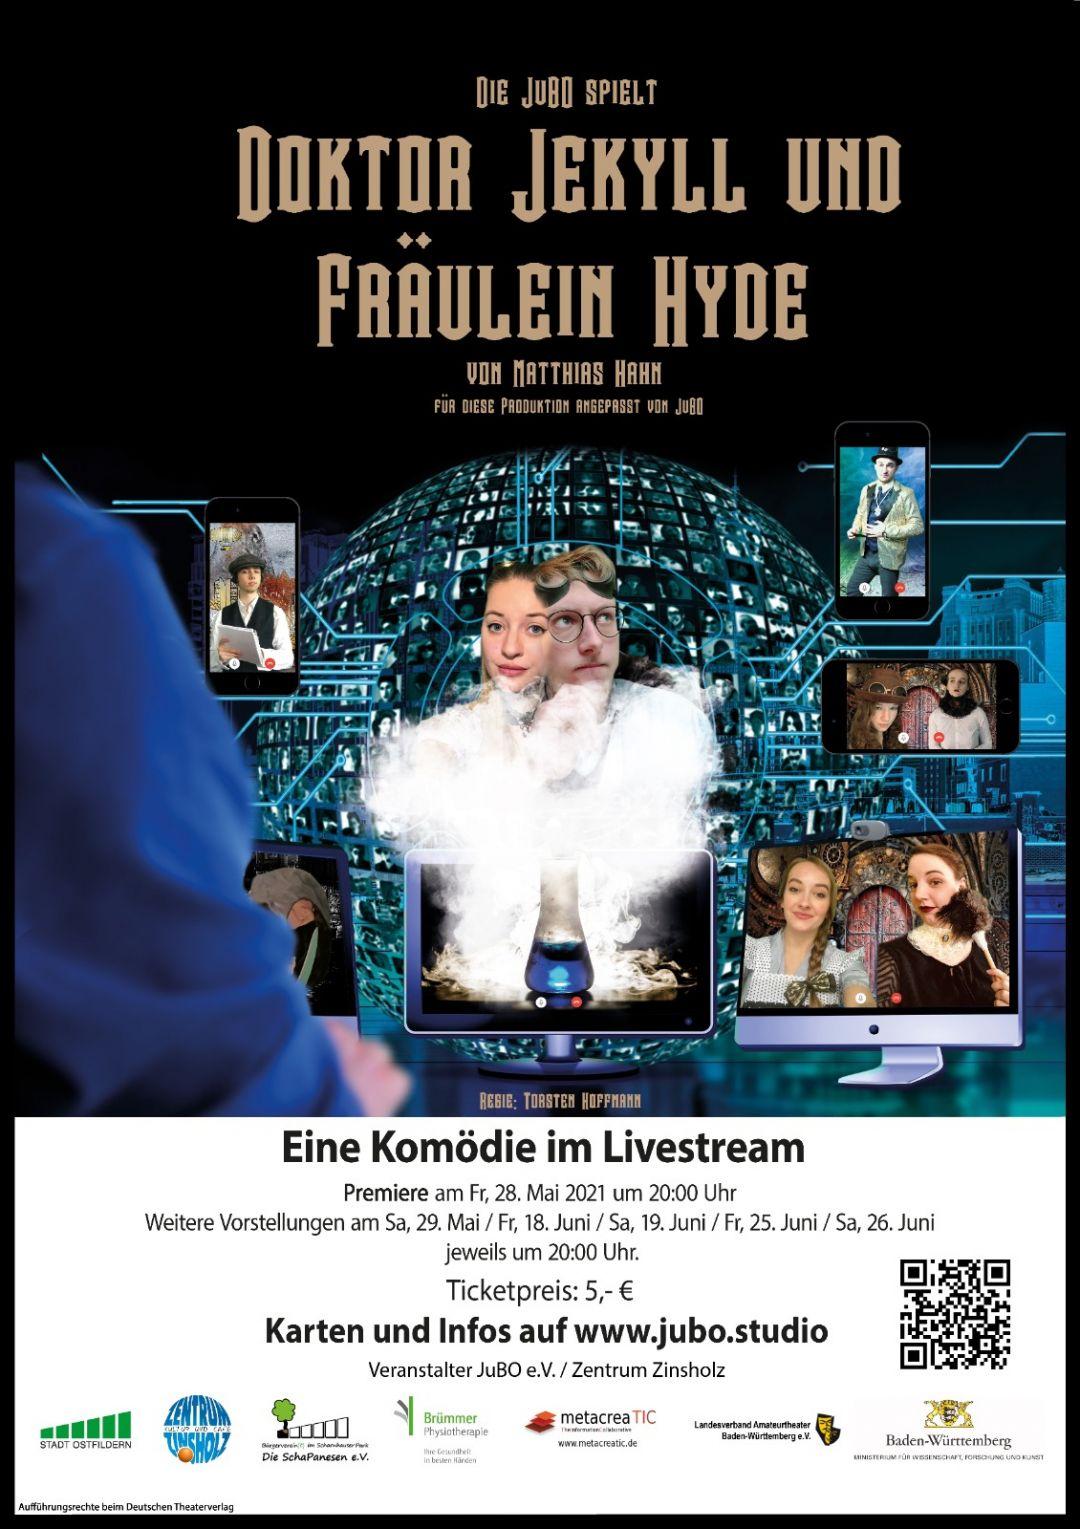 Doktor Jekyll & Fräulein Hyde